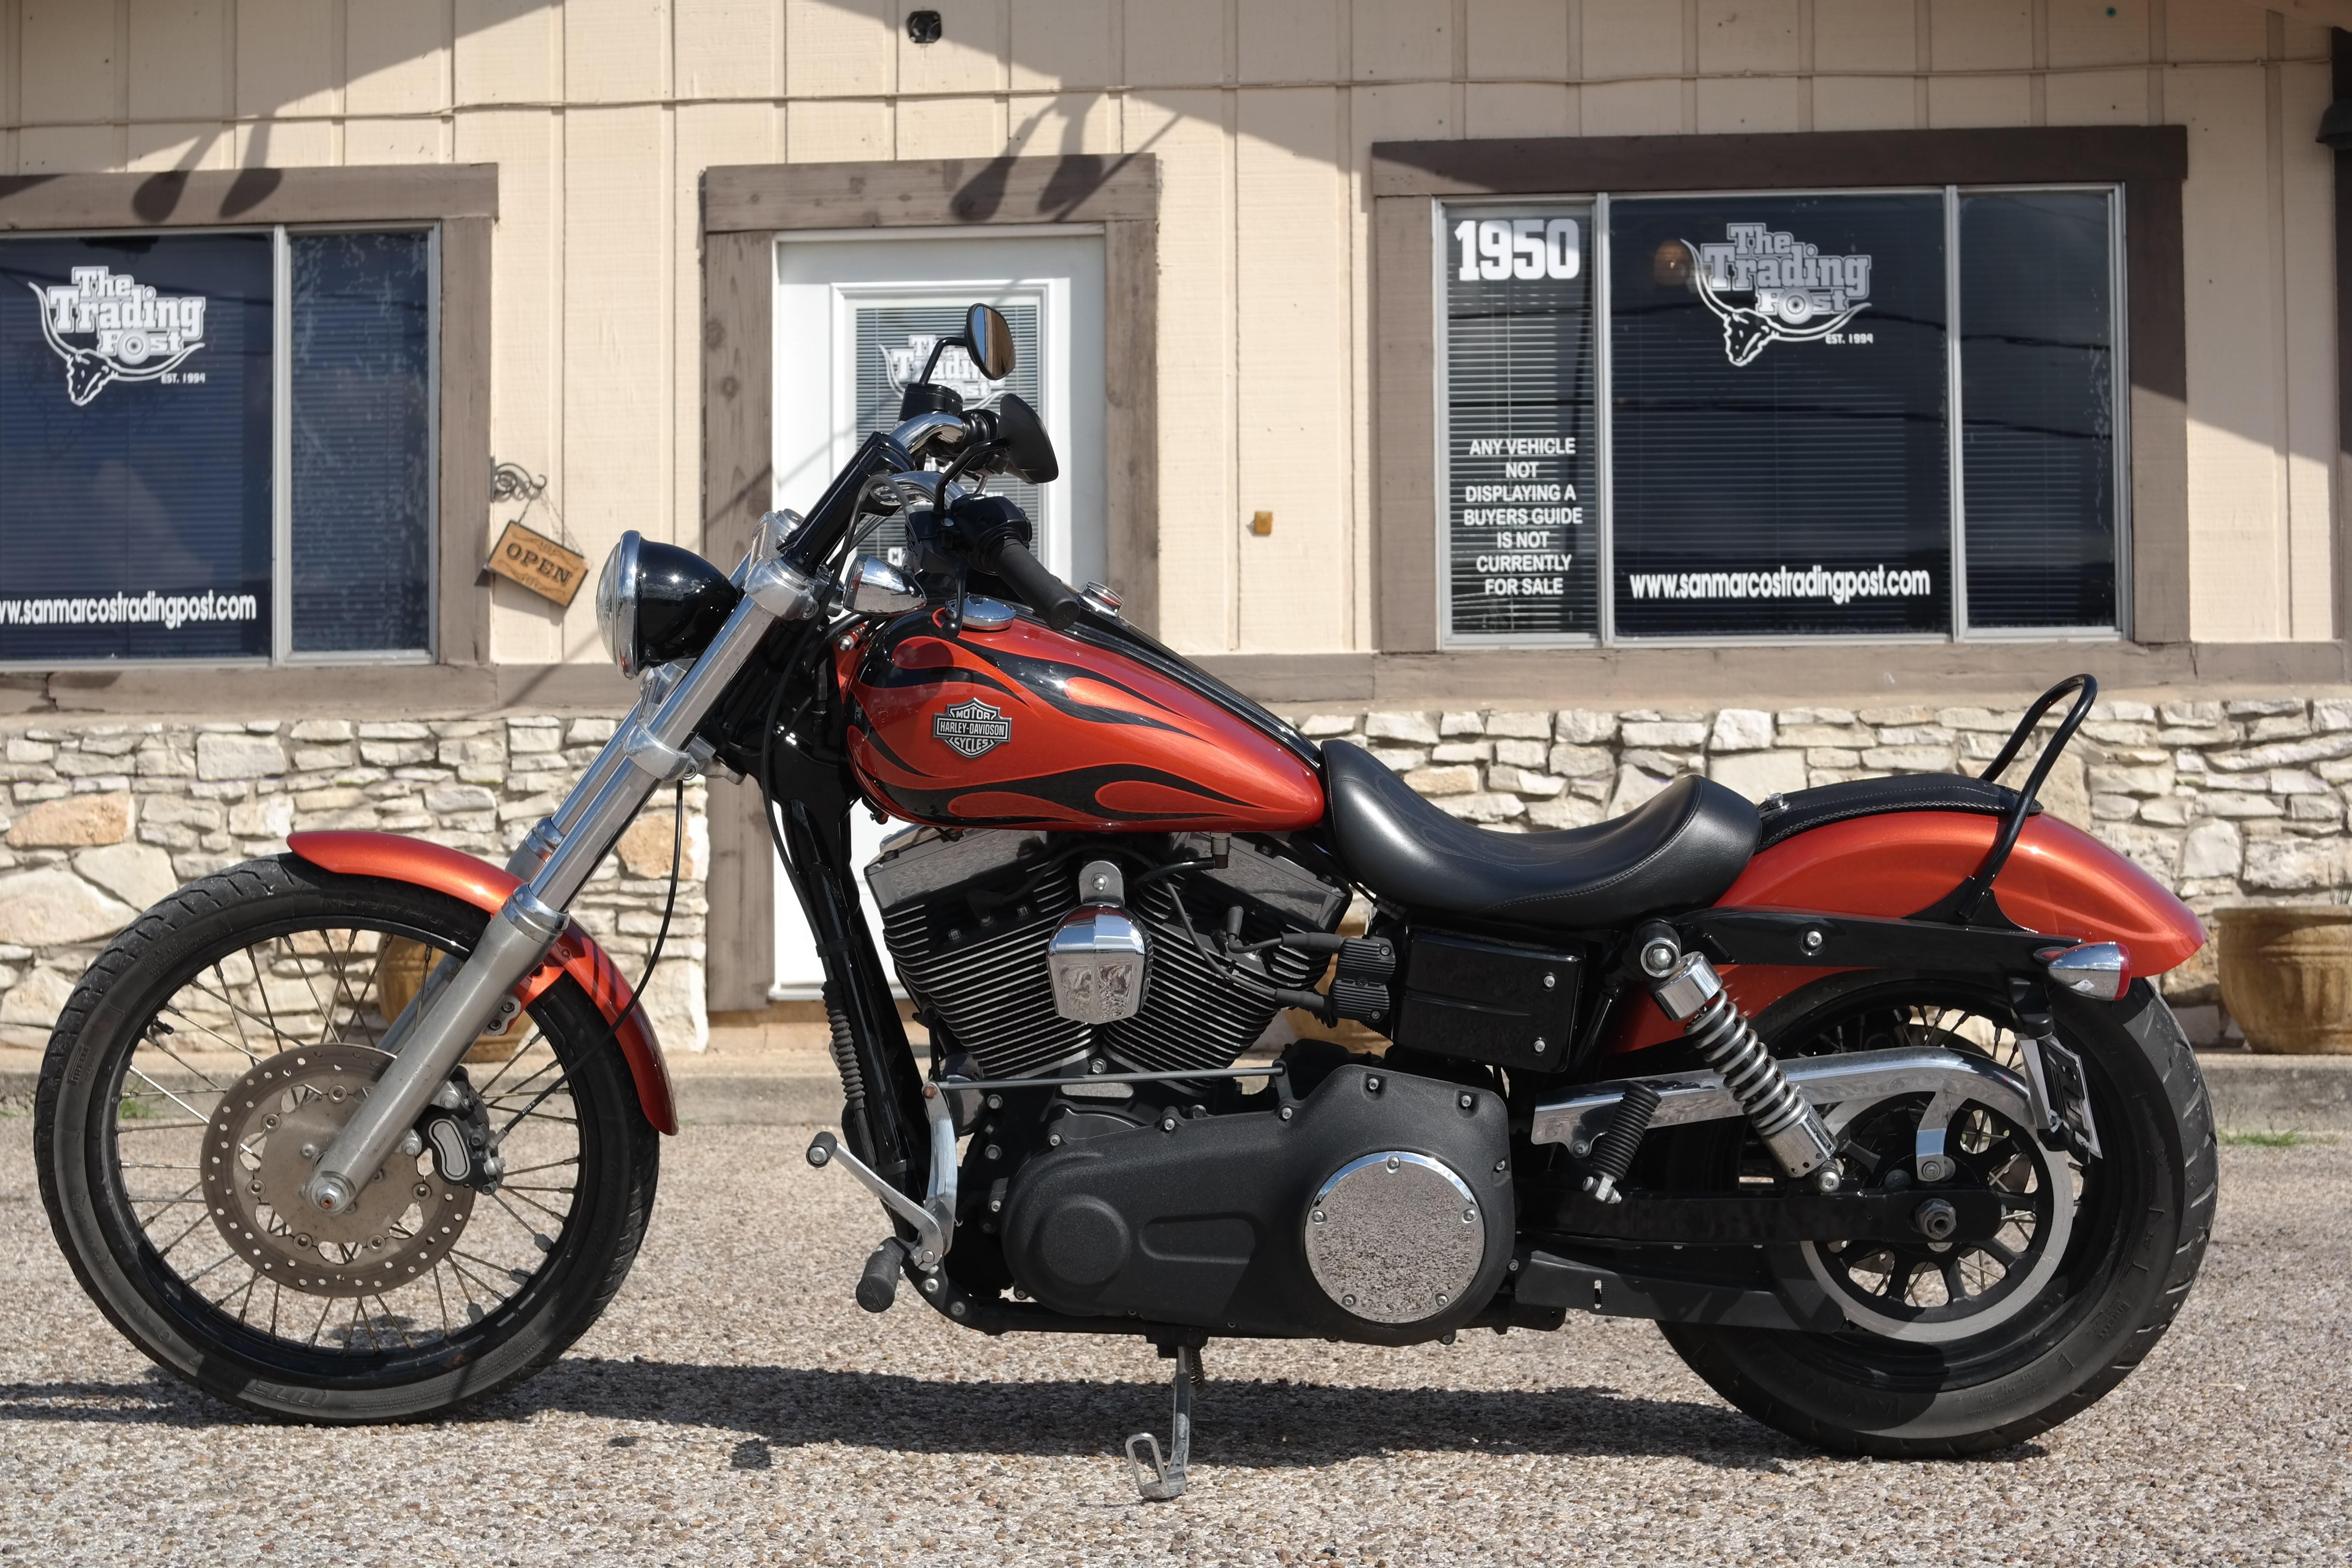 Harley Davidson Dyna Motorcycles For Sale San Marcos Tx >> Harley Davidson Dyna Motorcycles For Sale San Marcos Tx New Car